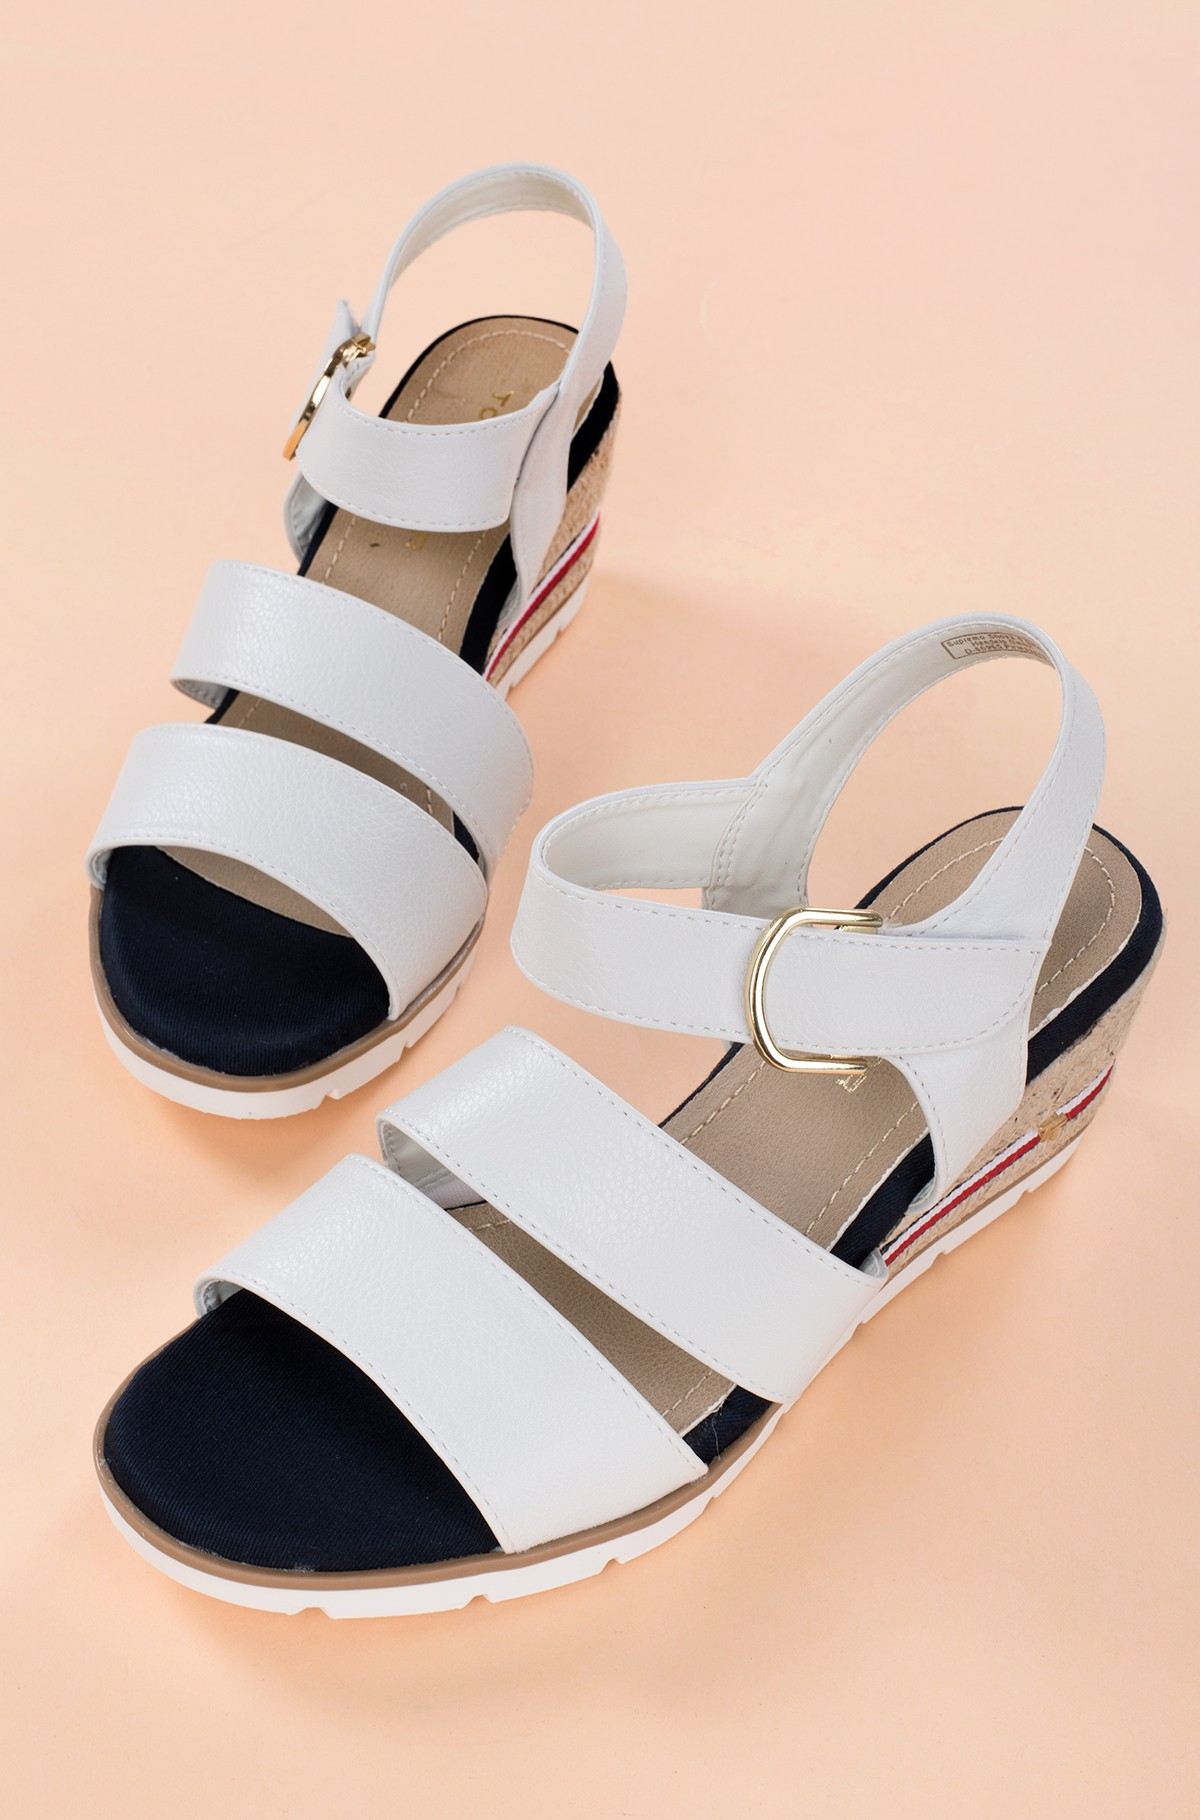 Platform shoes 8090402-full-1